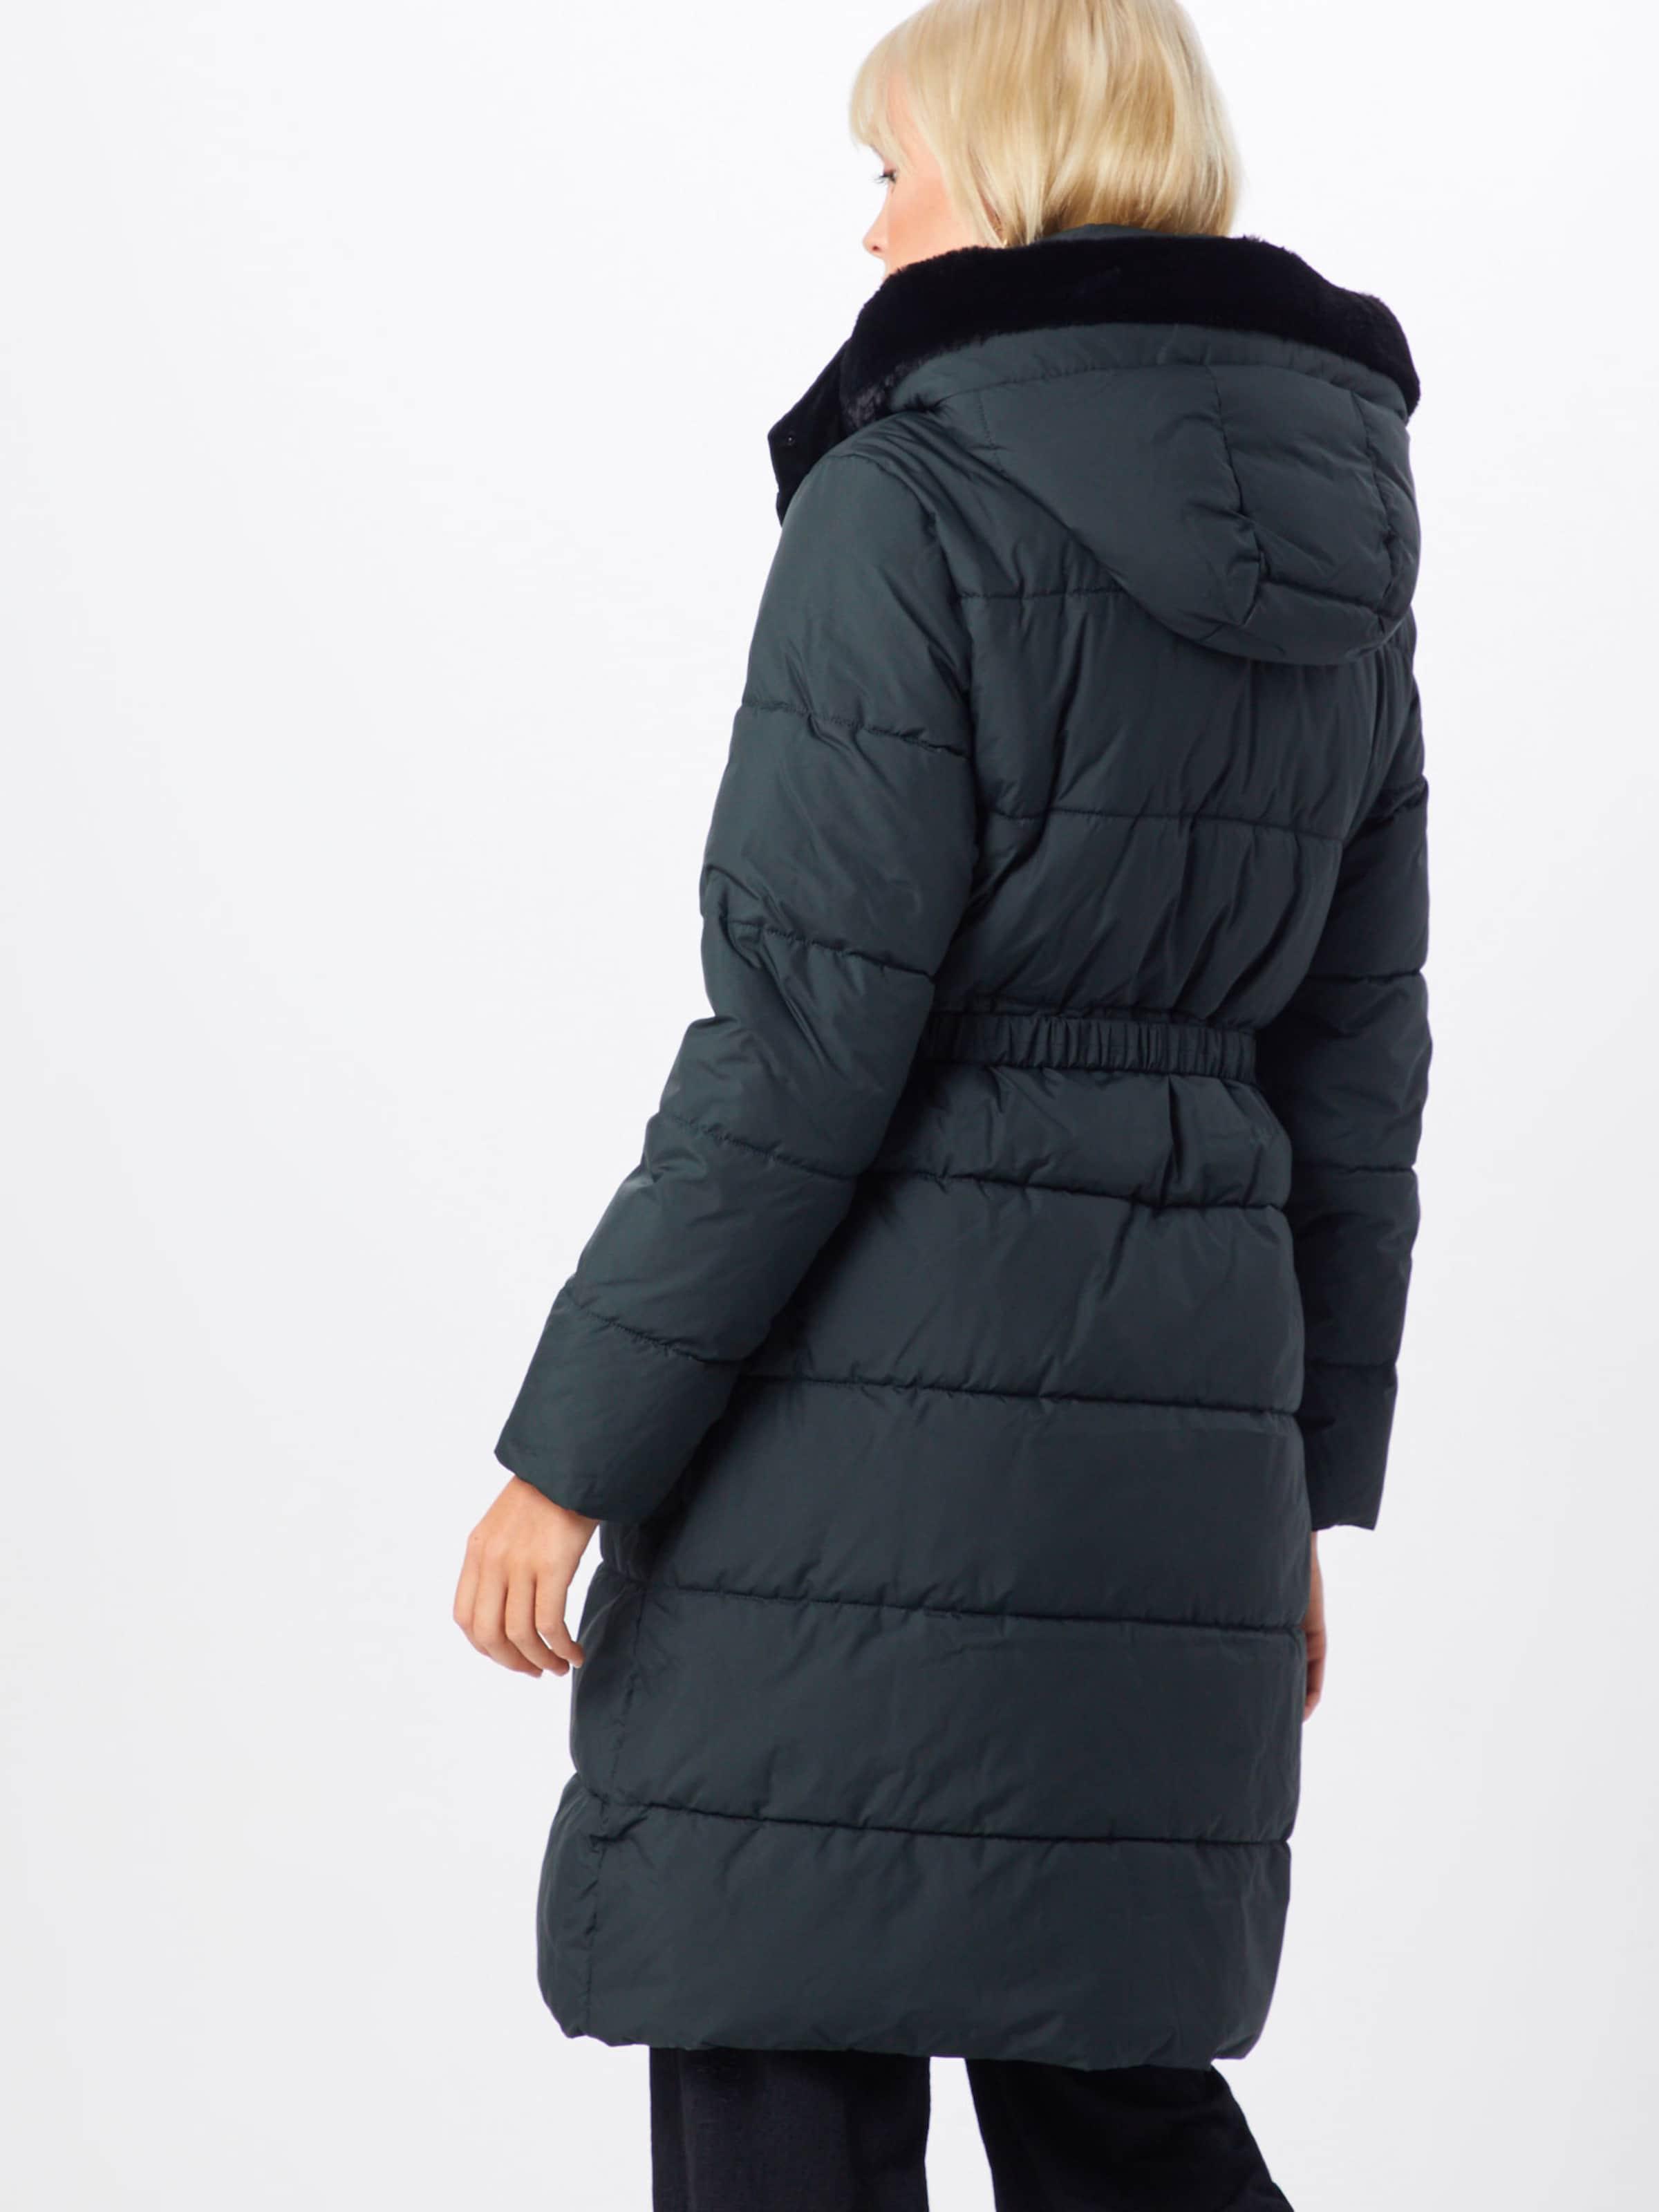 D'hiver Vert Manteau 'i WFur Trim Long Puffer Banana Hood' Republic En 0wyN8OvmnP